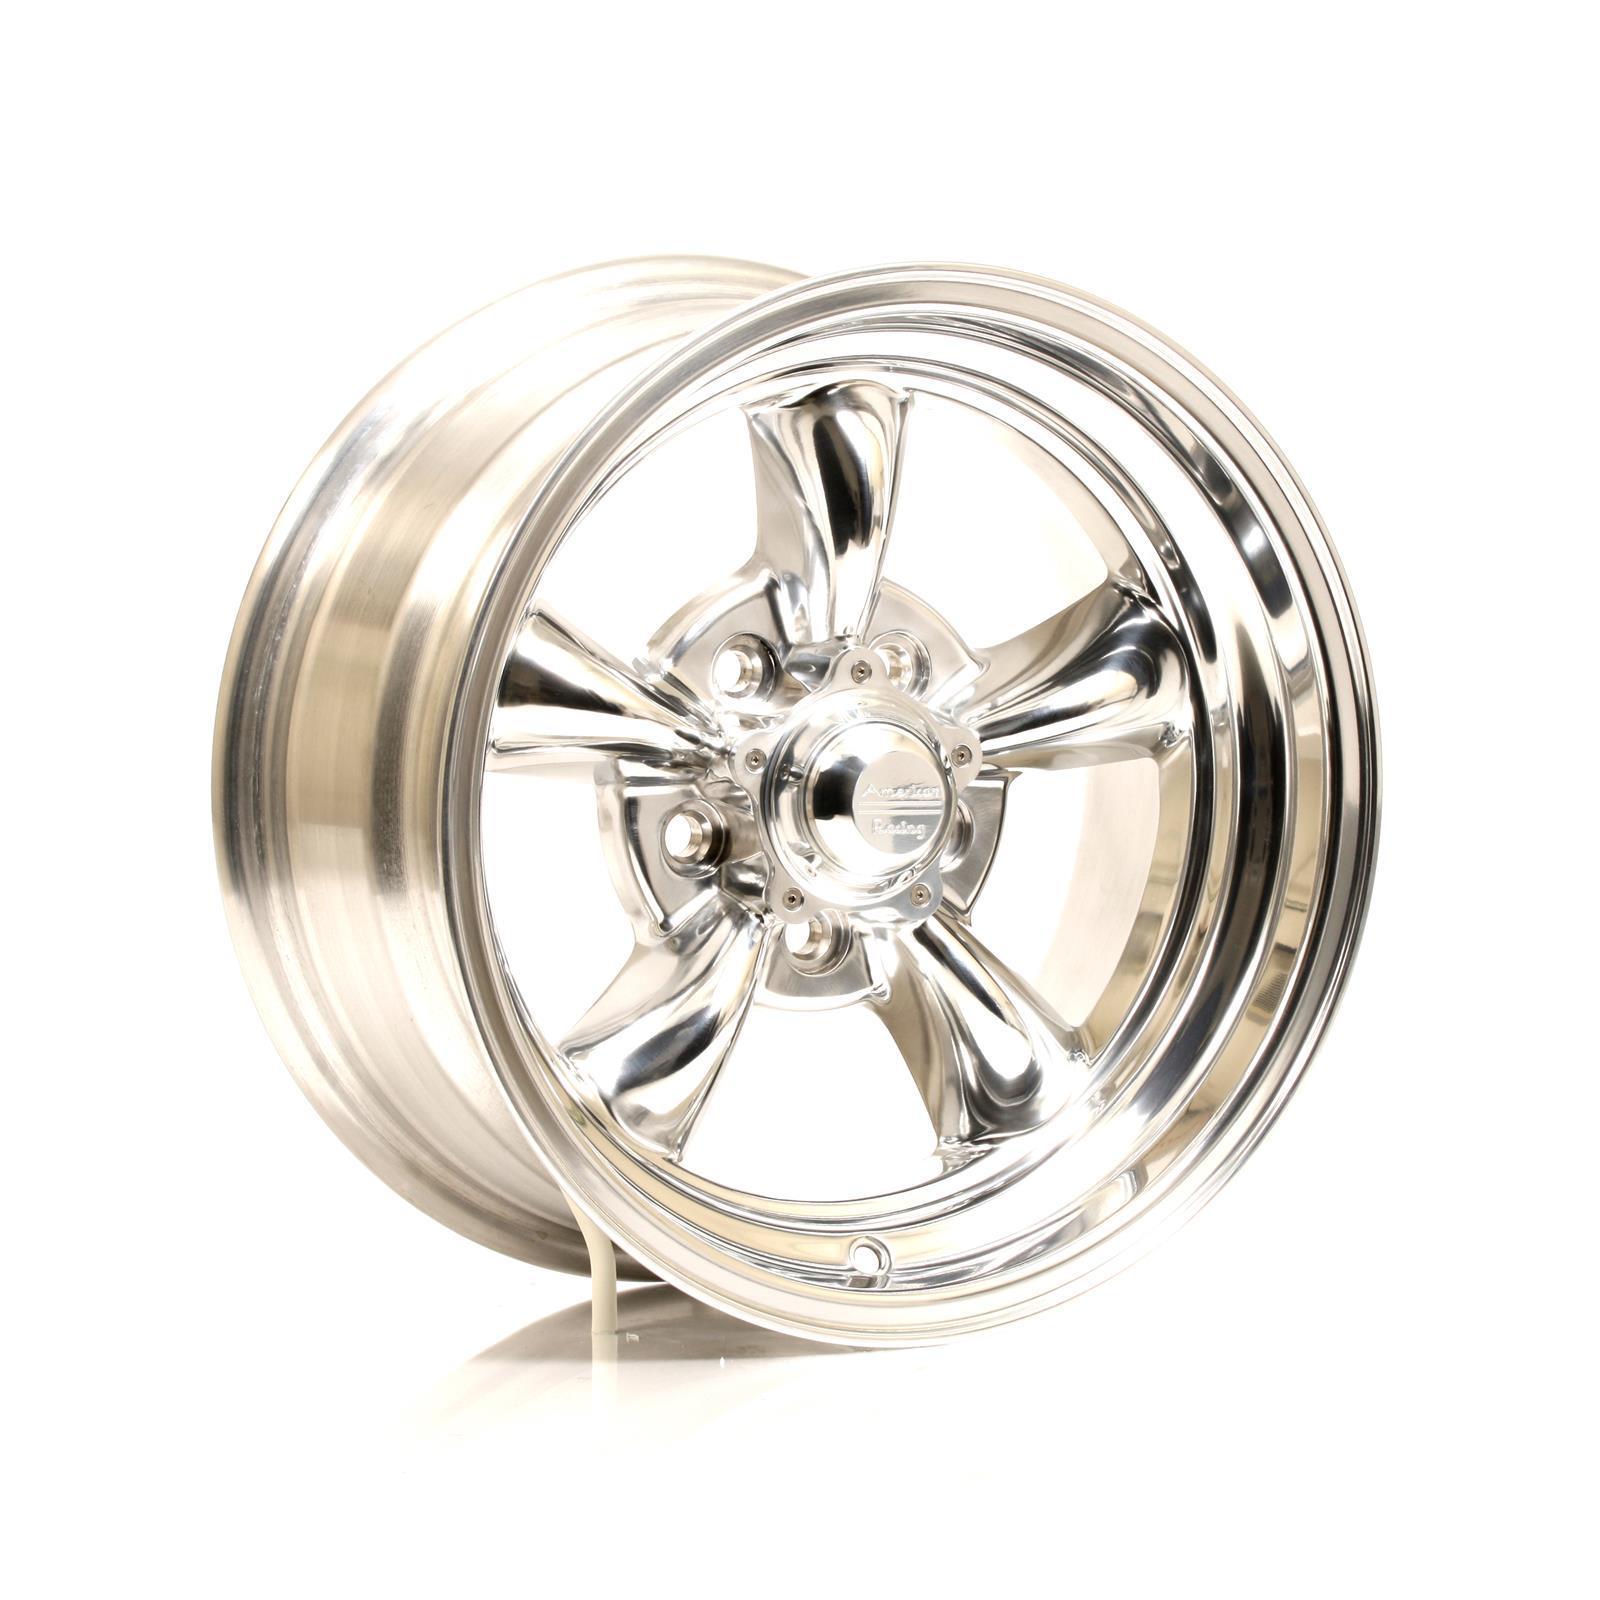 American Racing VN515 Polished Torq-Thrust II One-Piece Wheels VN5155765